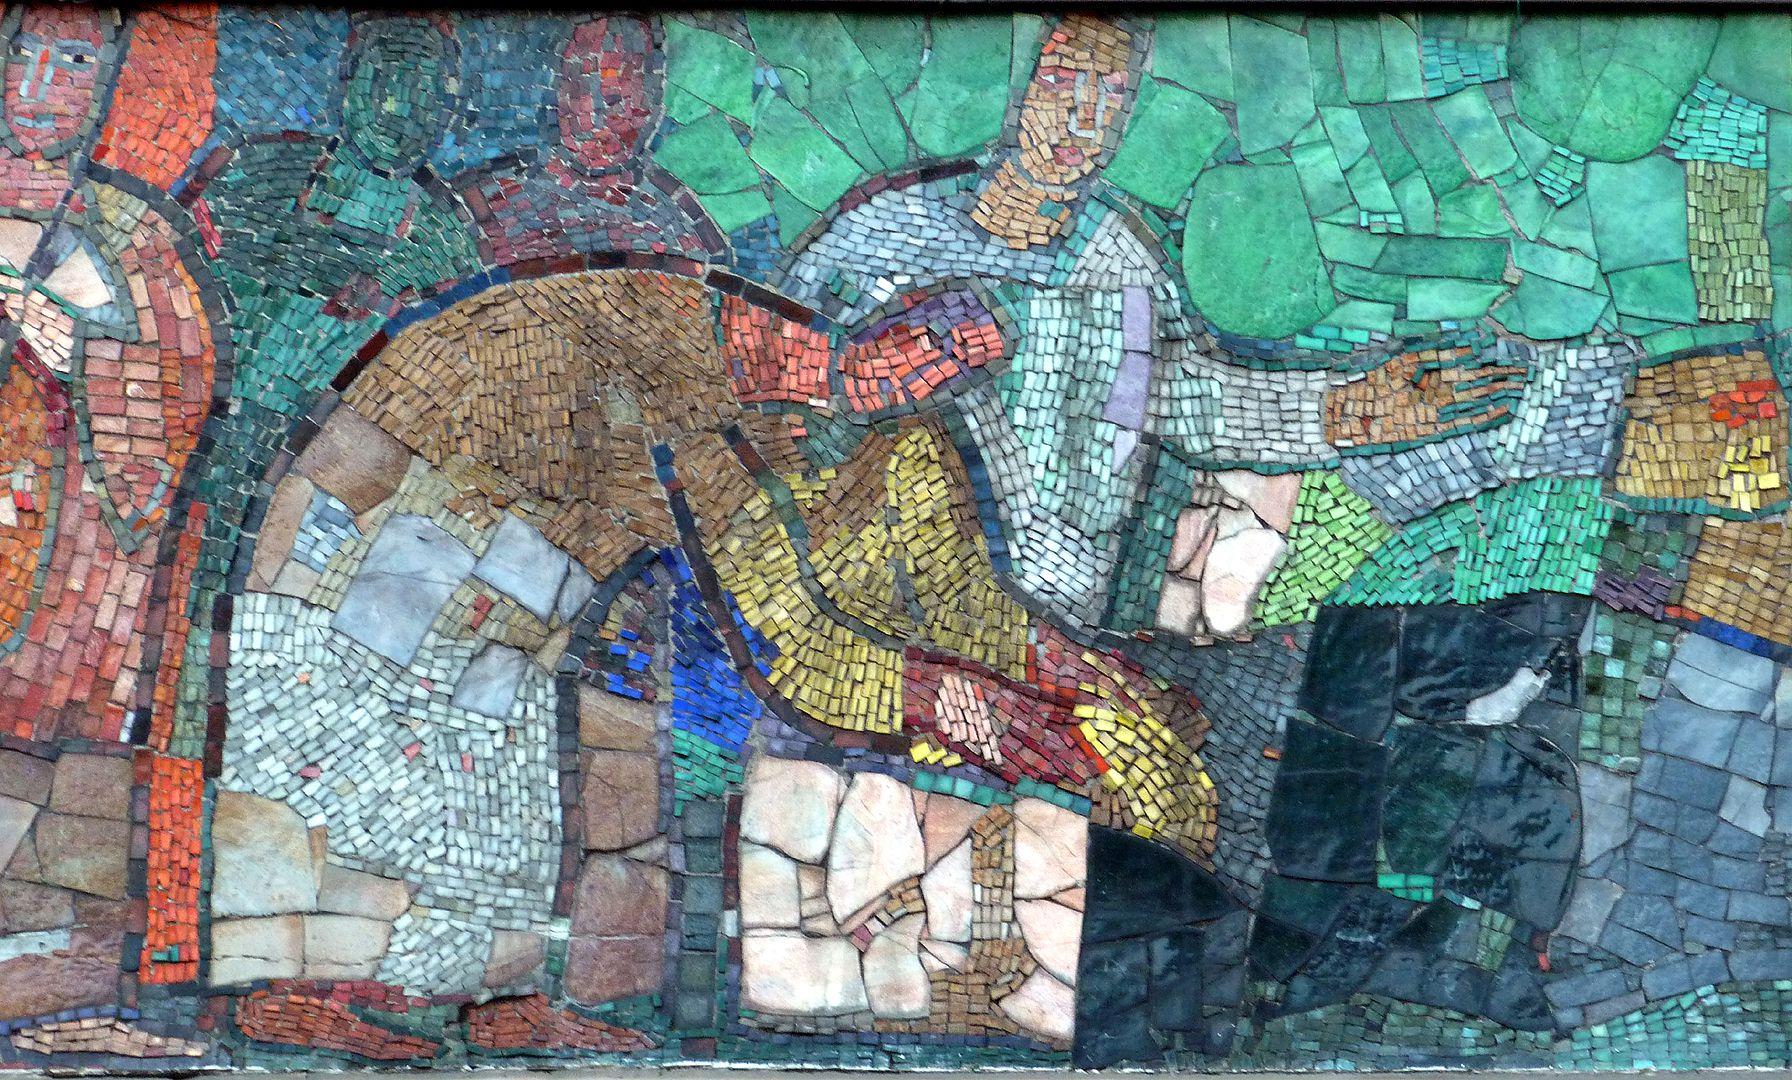 Mosaik am Hauptmarkt in Nürnberg Händler